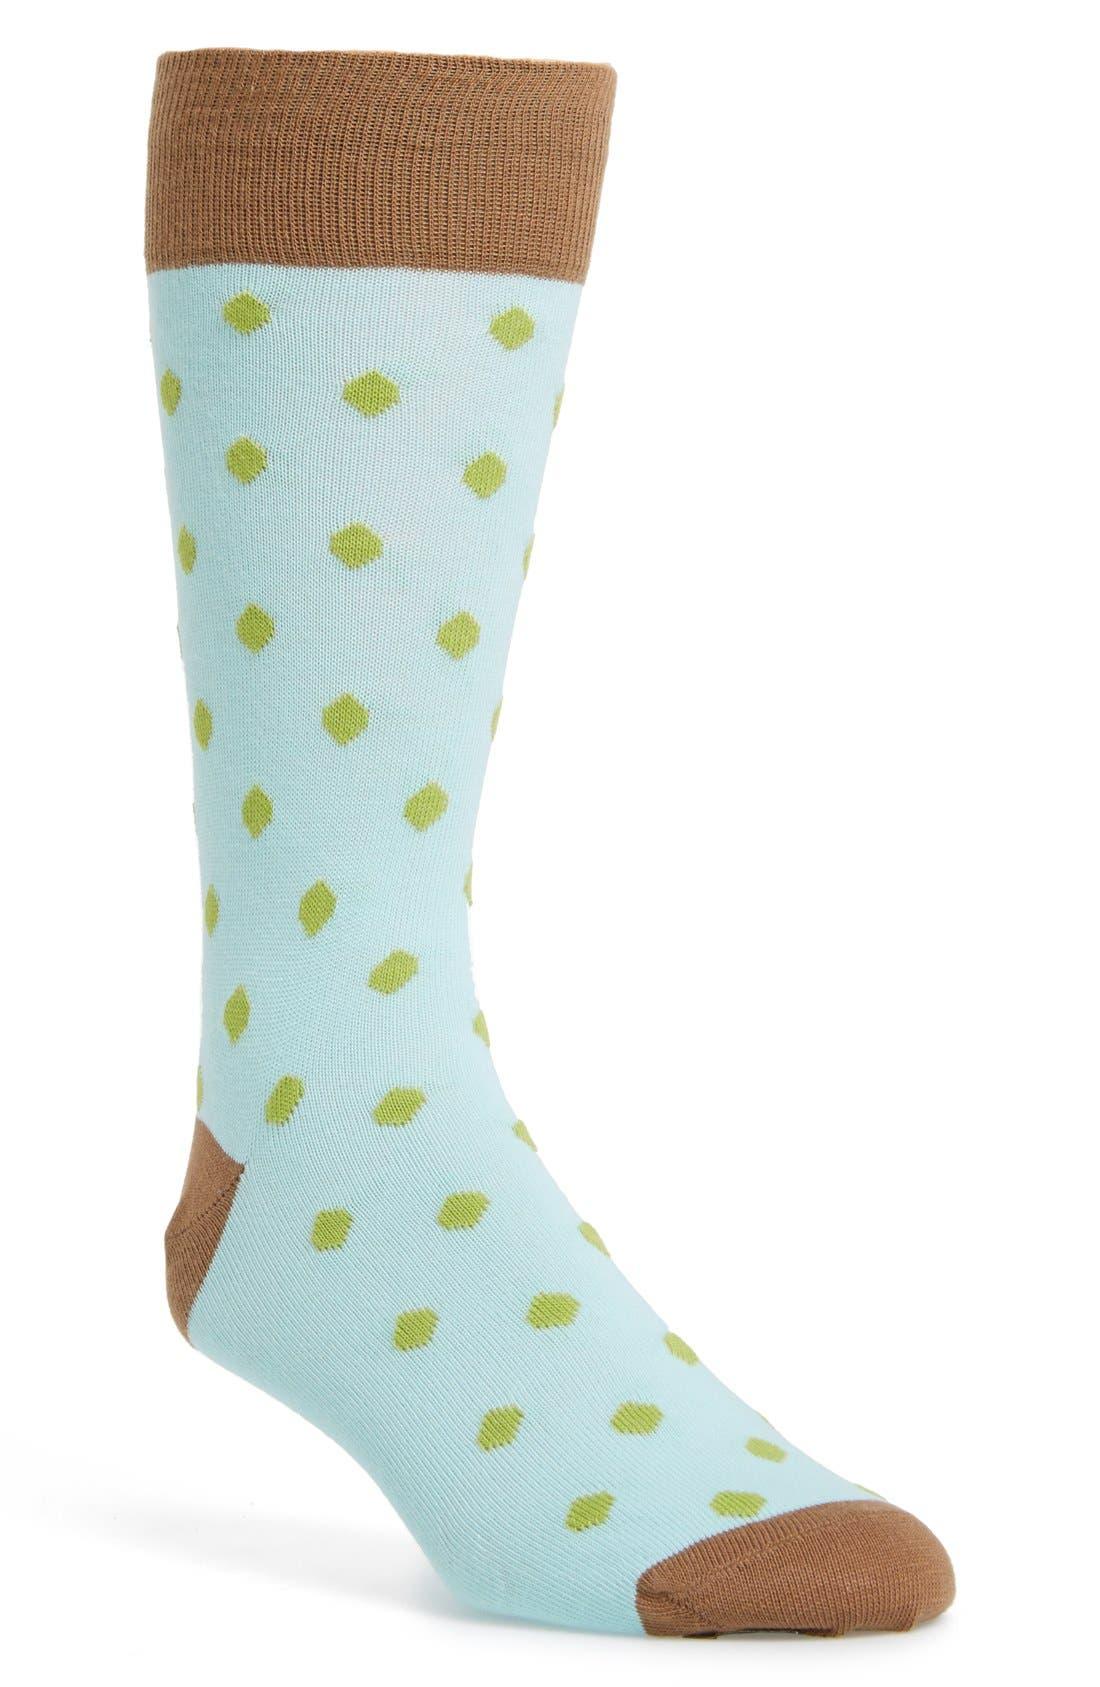 Main Image - Lorenzo Uomo Organic Leaf Dot Socks